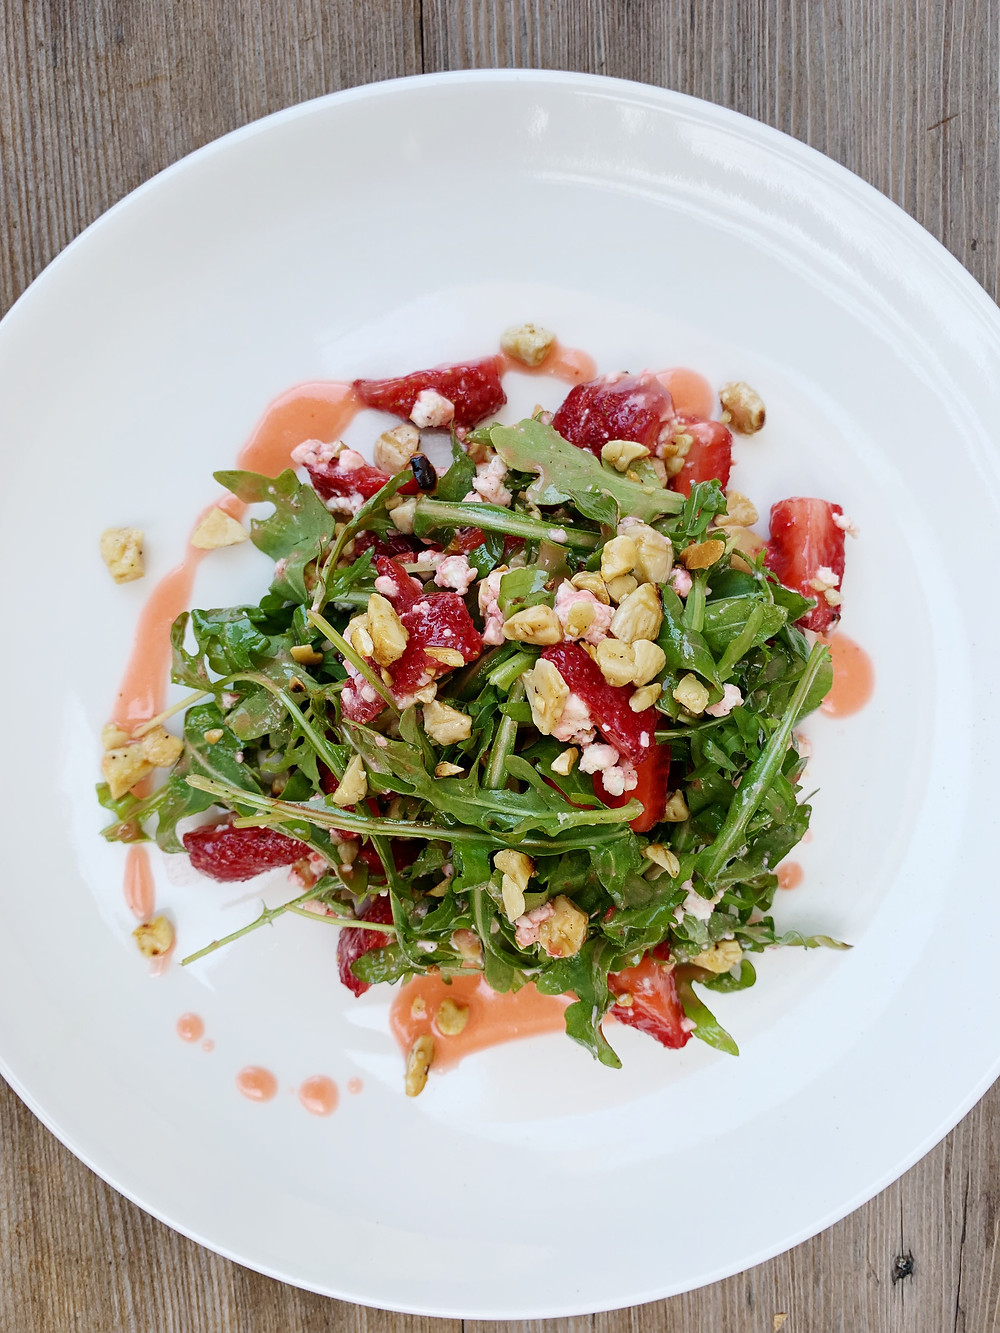 local strawberry salad arugula, french feta, toasted almonds, strawberry vinaigrette